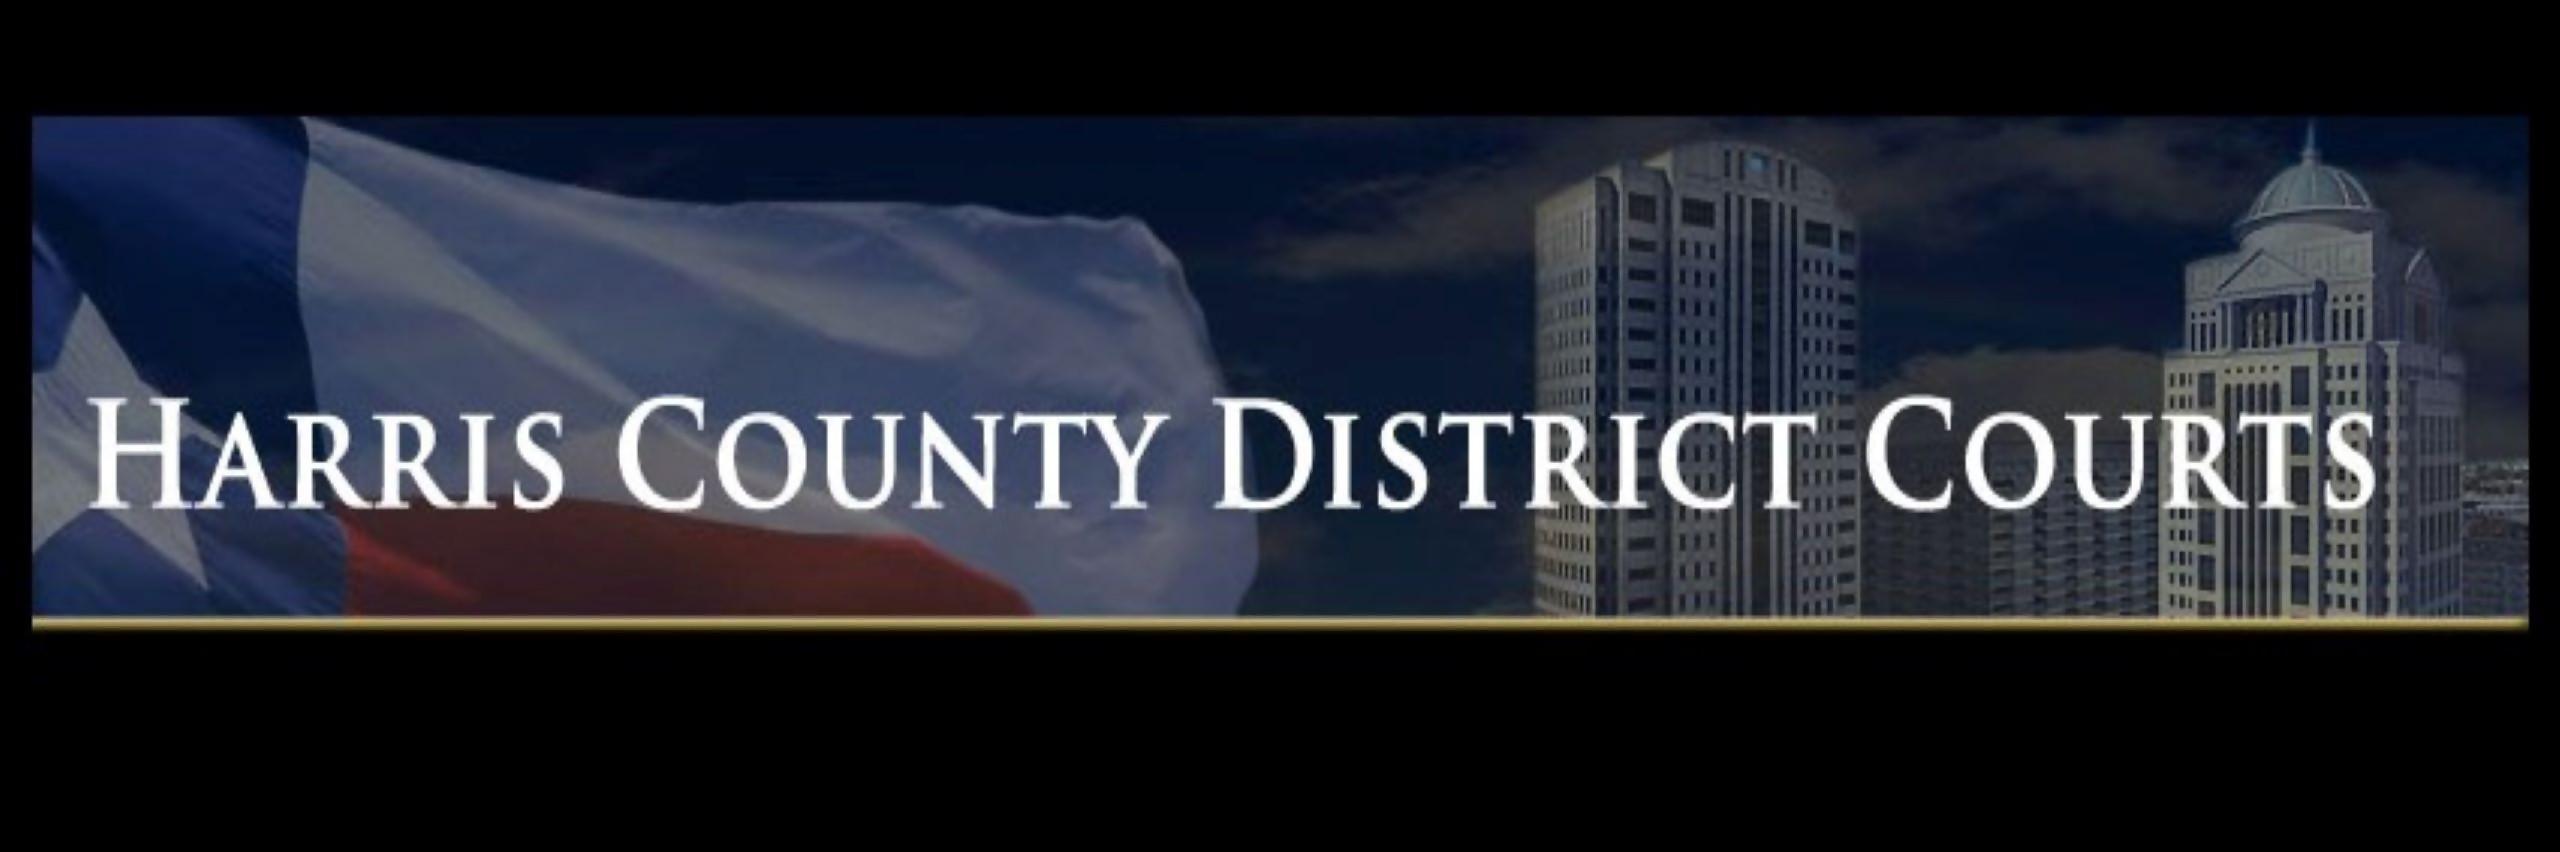 61st District Court - Live Stream